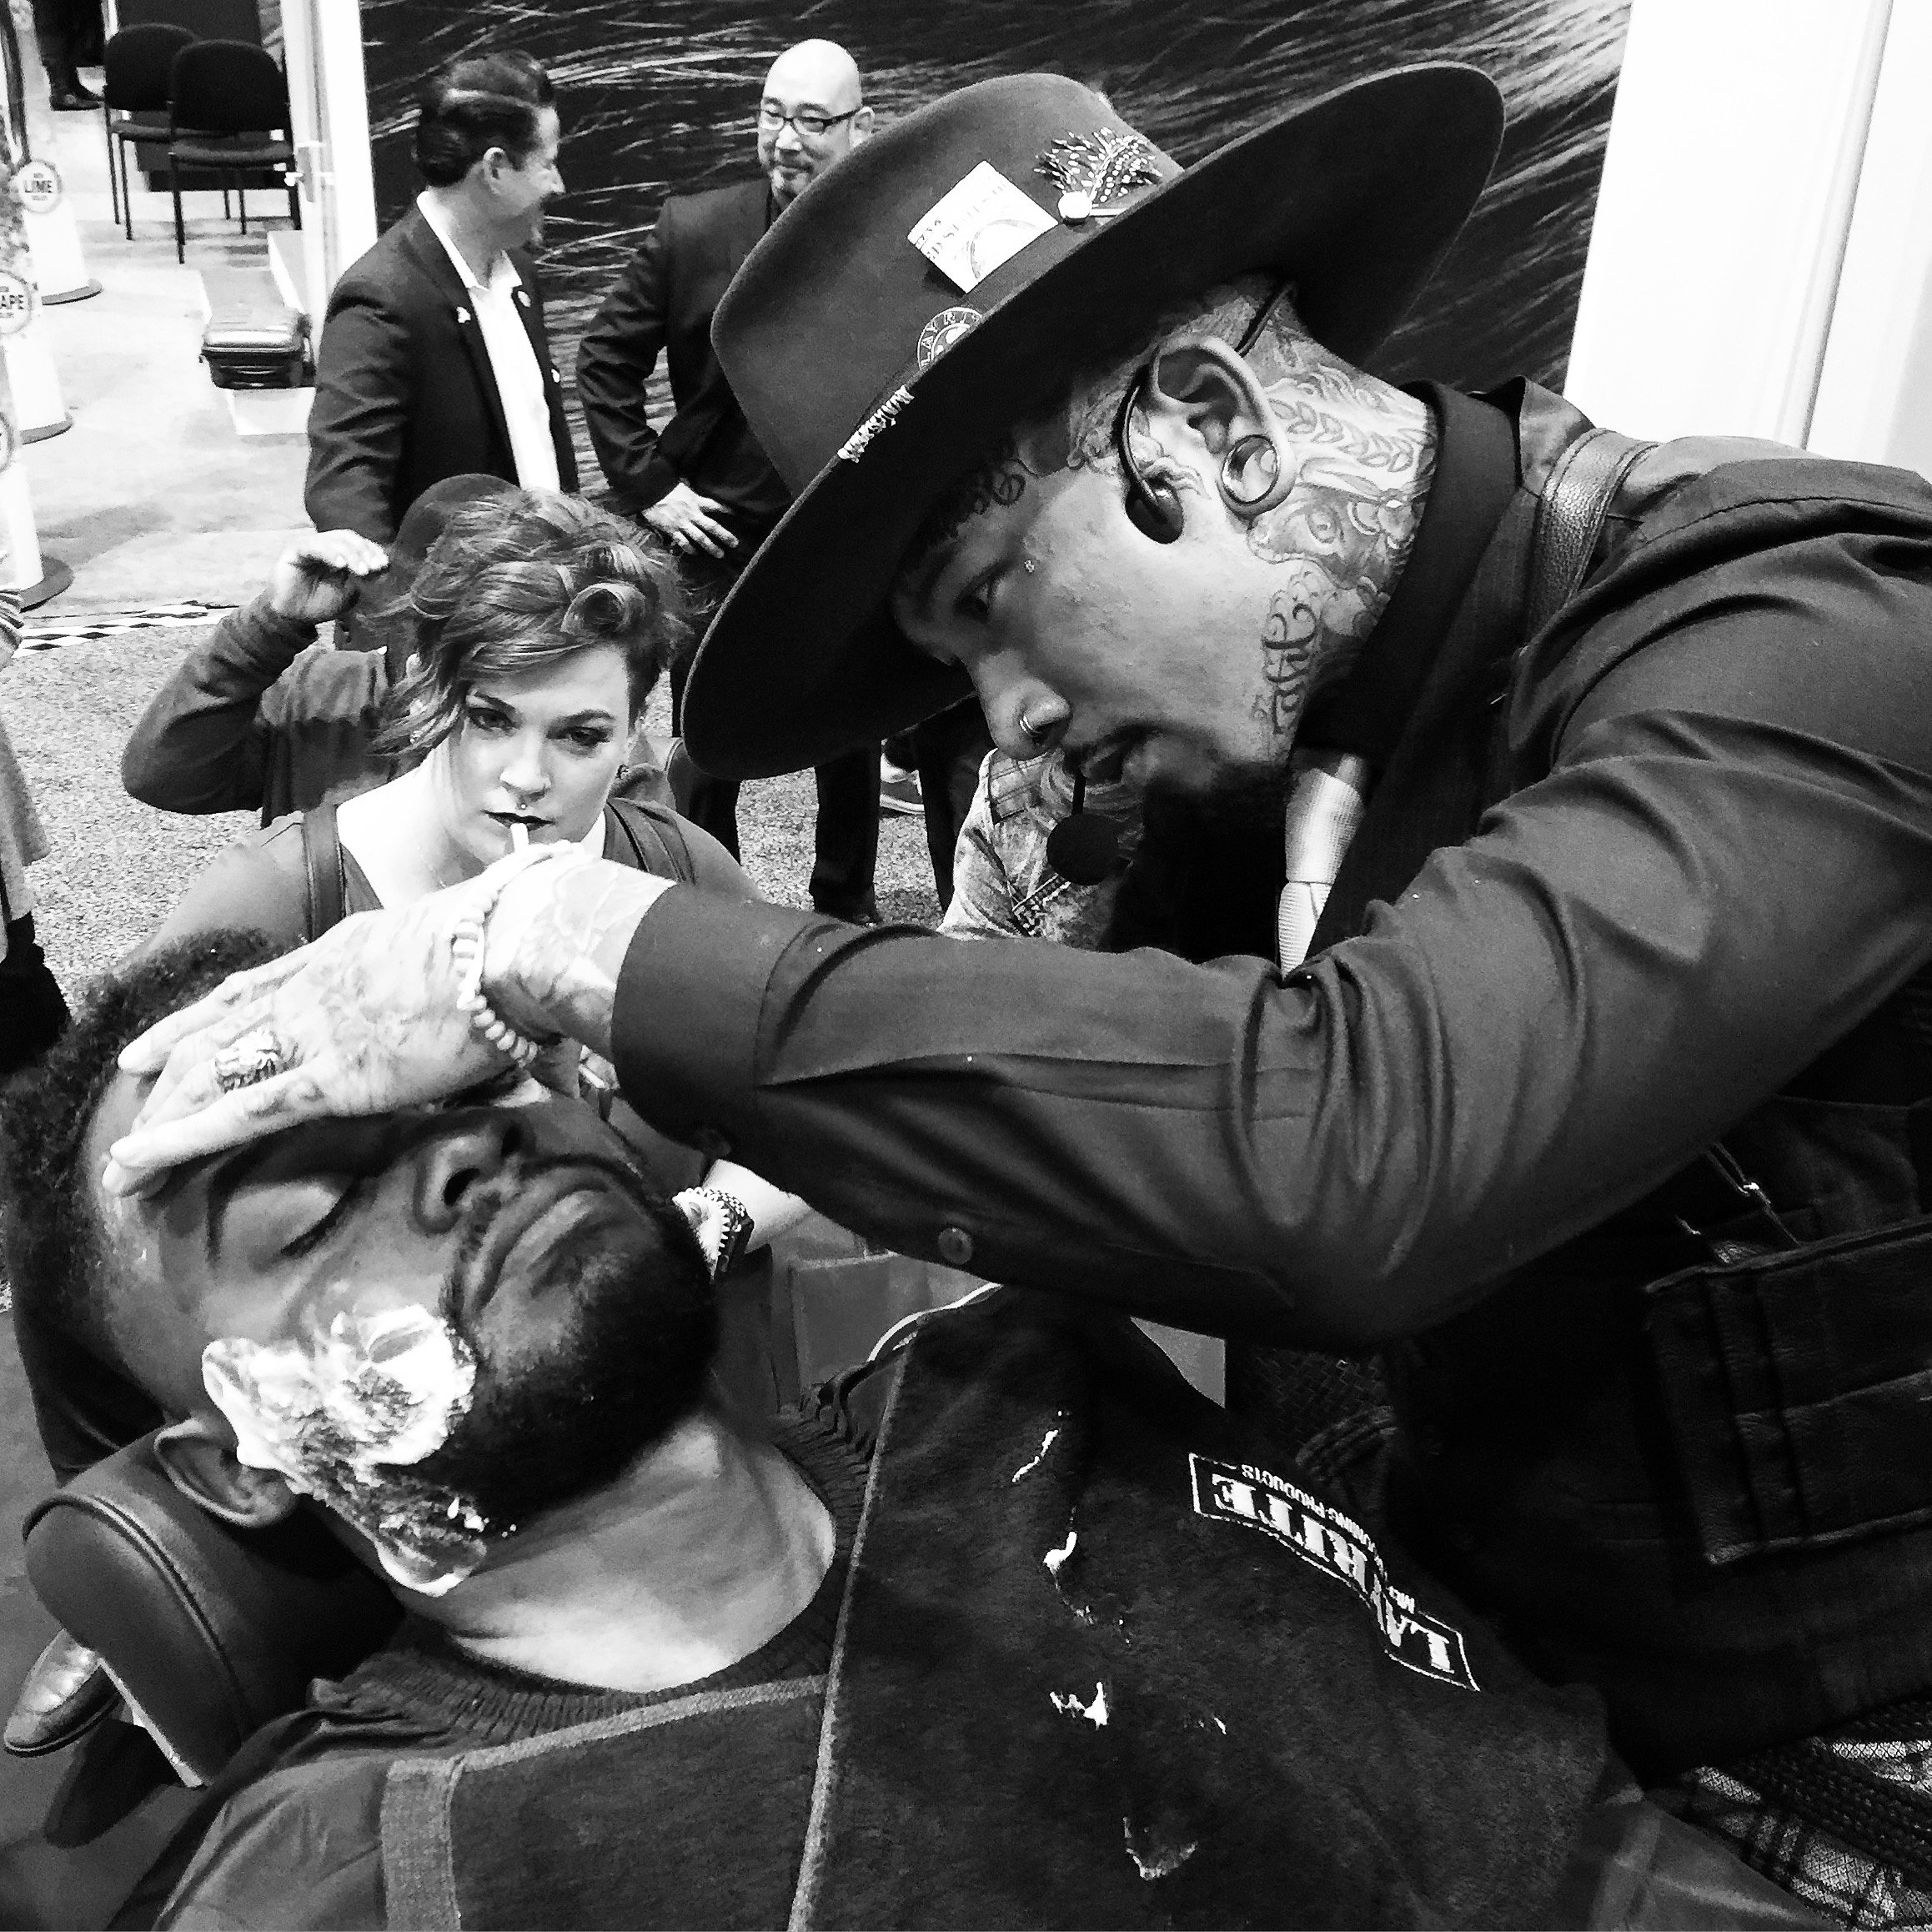 Julius Cvesar - Barber/Creative Director